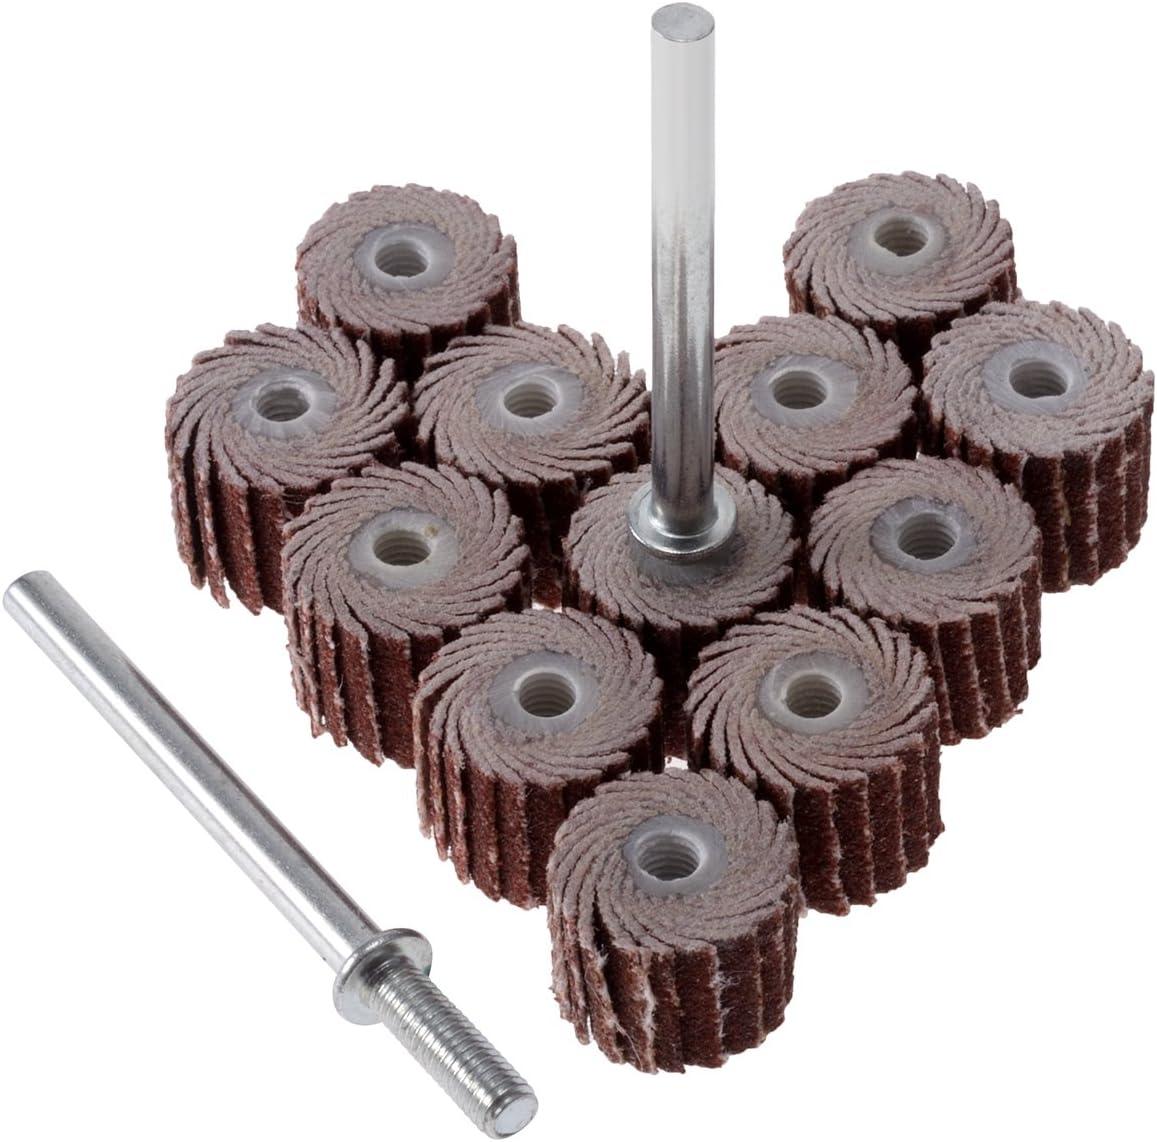 10mm Grinder Power Rotary Tool Flap Sanding Sandpaper Wheel Disc Set 240# Grit